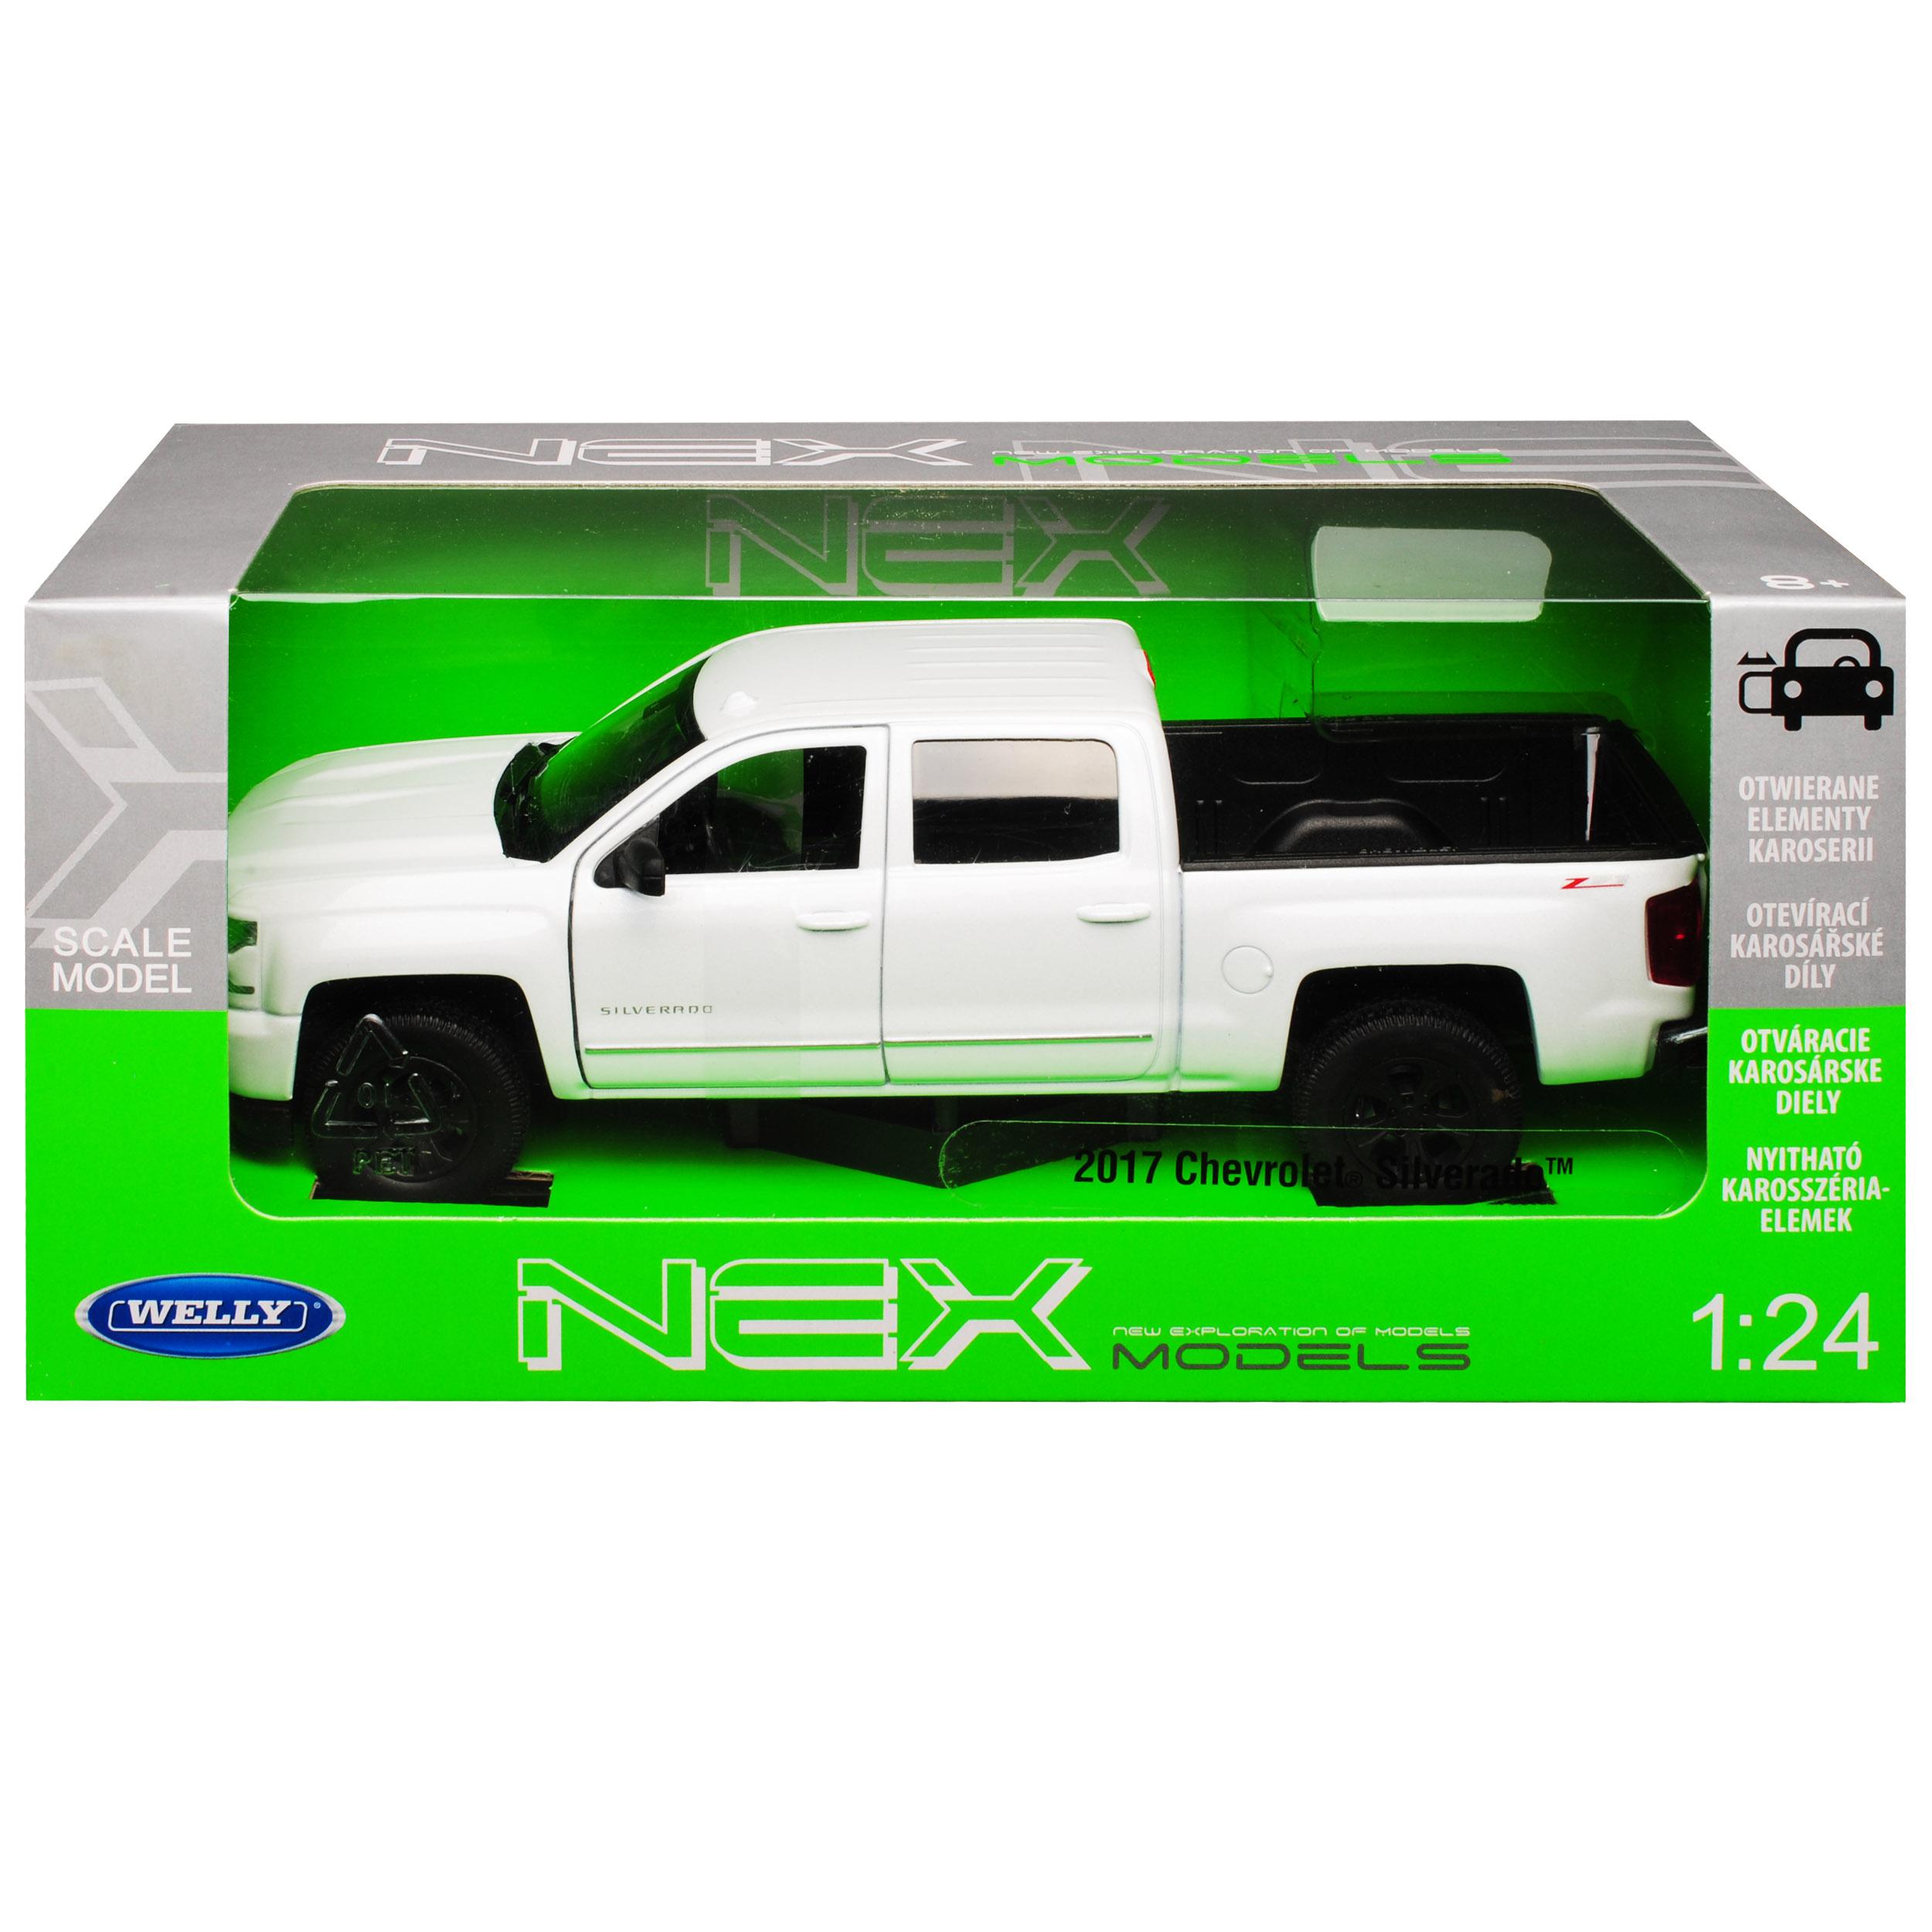 #24083 1:24 weiss Welly Chevrolet Silverado